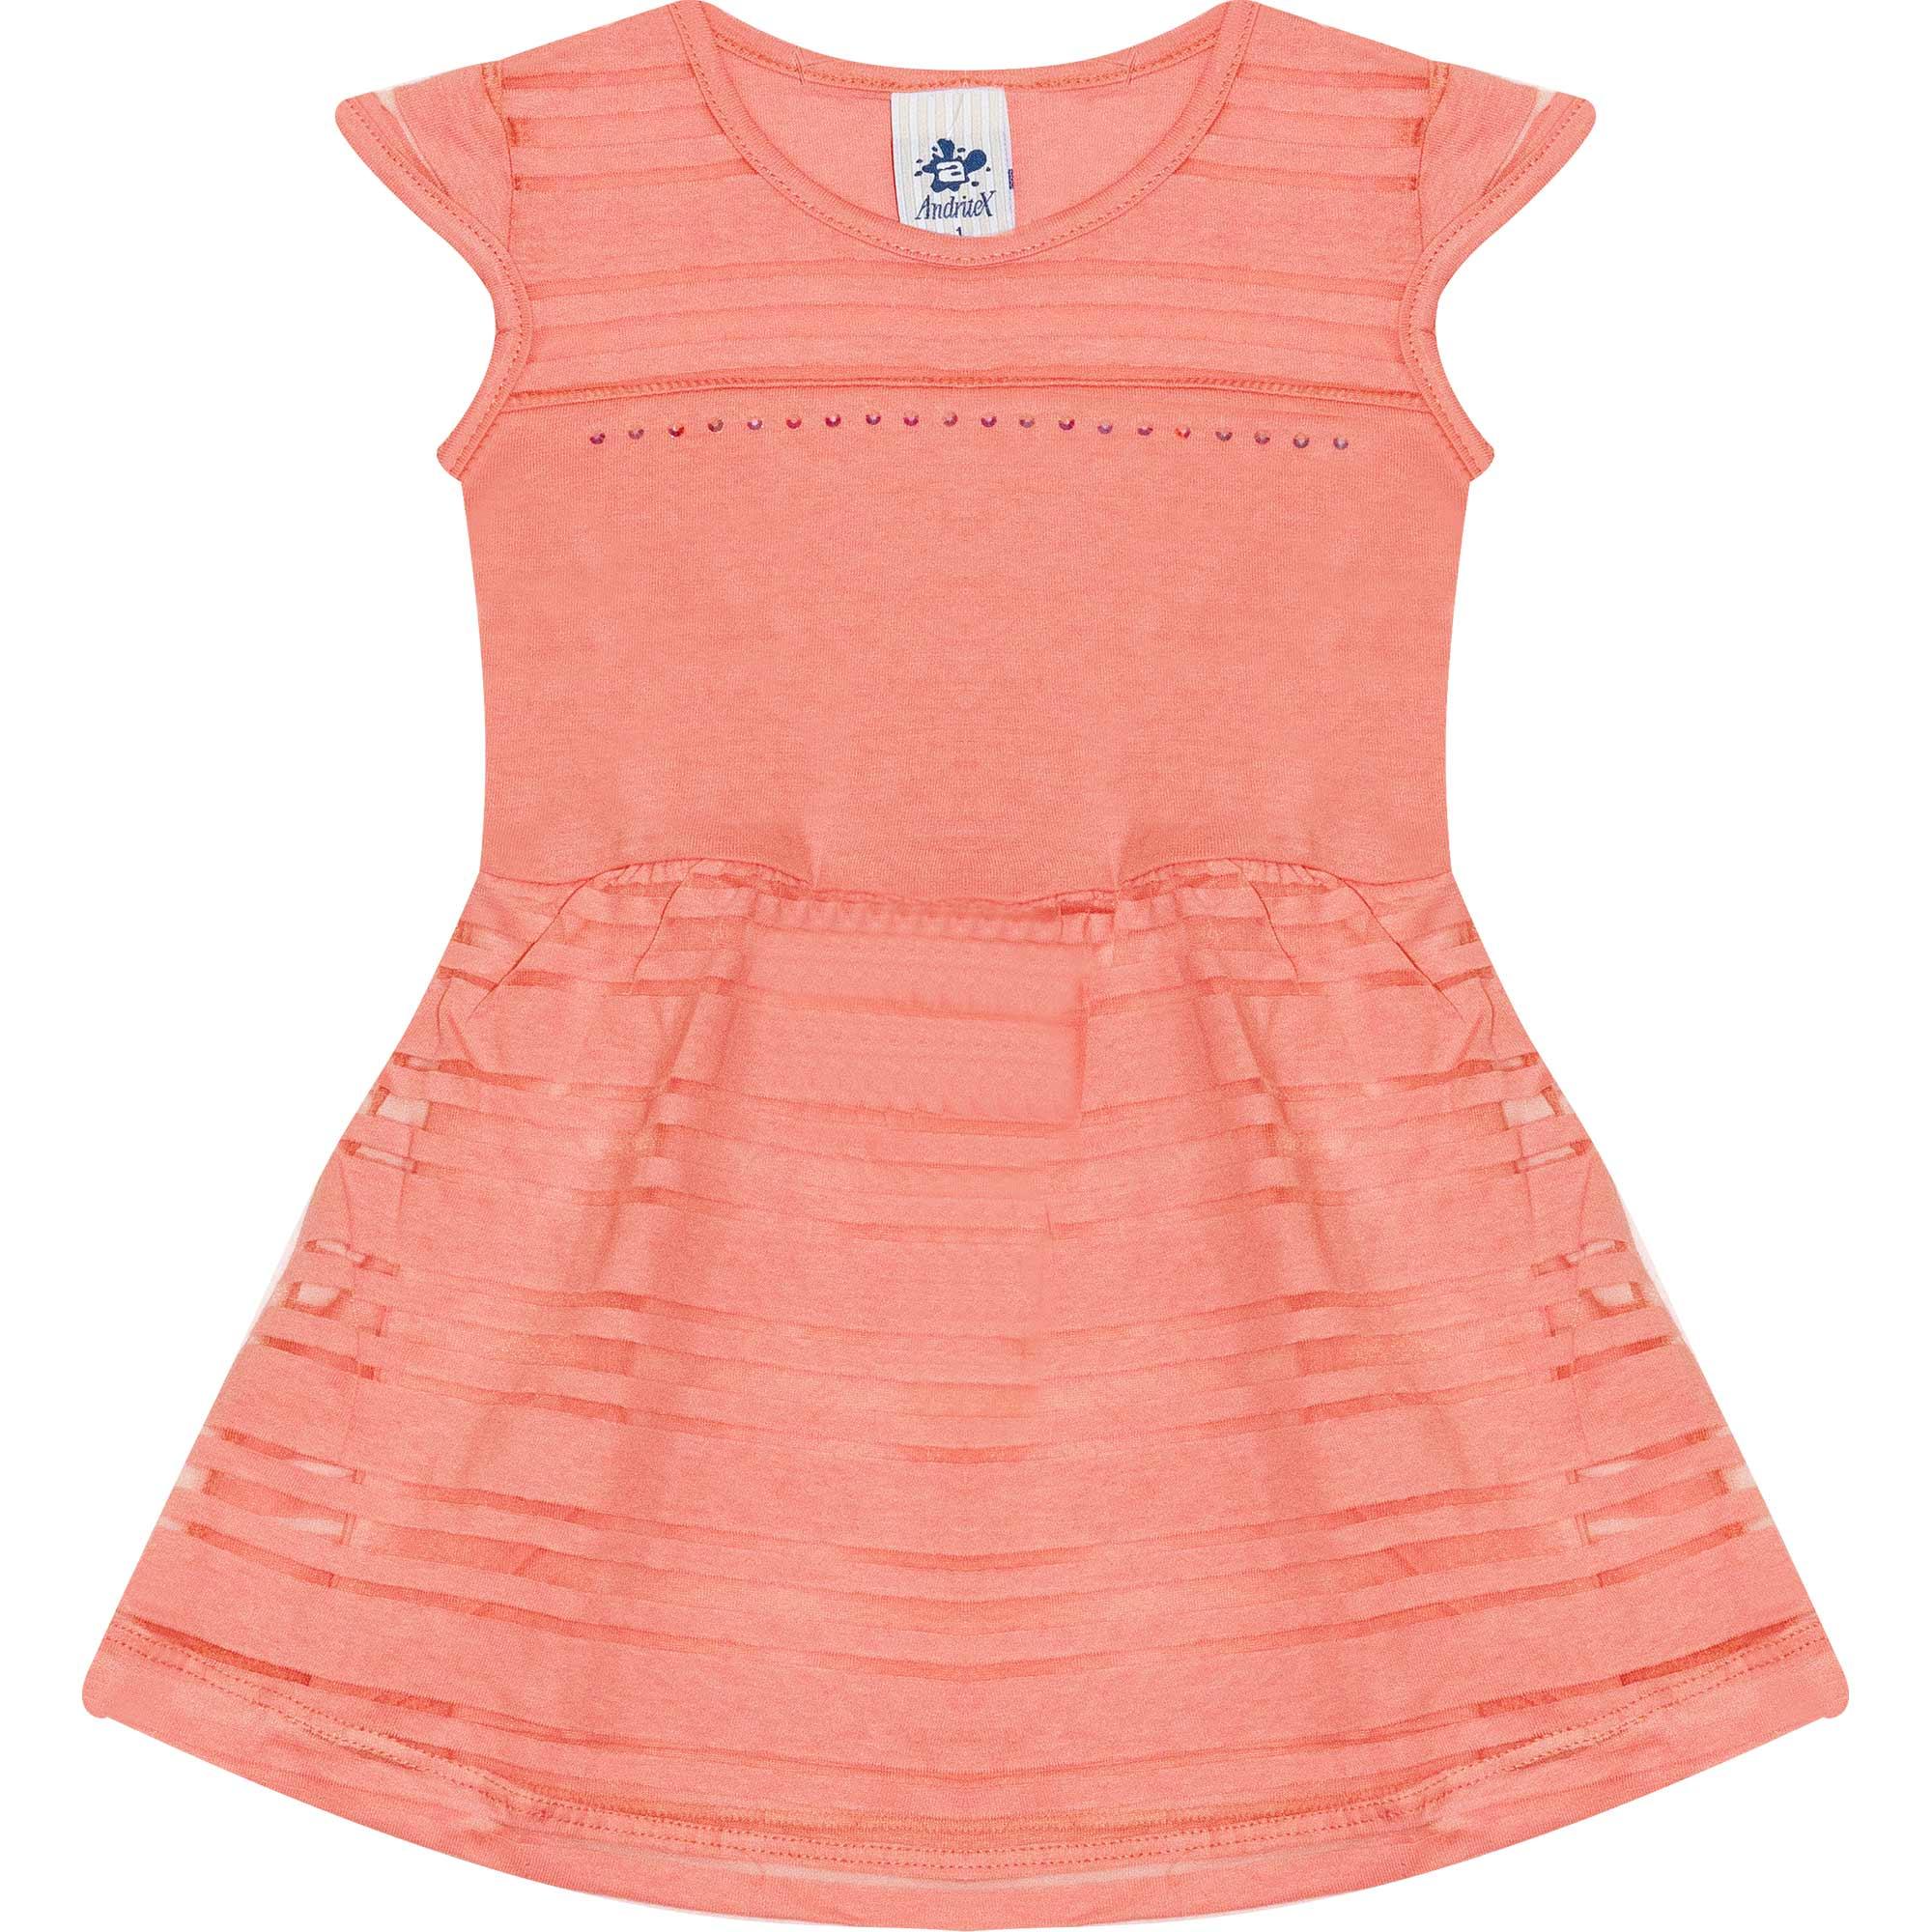 Vestido Infantil Feminino - Ref 4717  - Salmão - Andritex